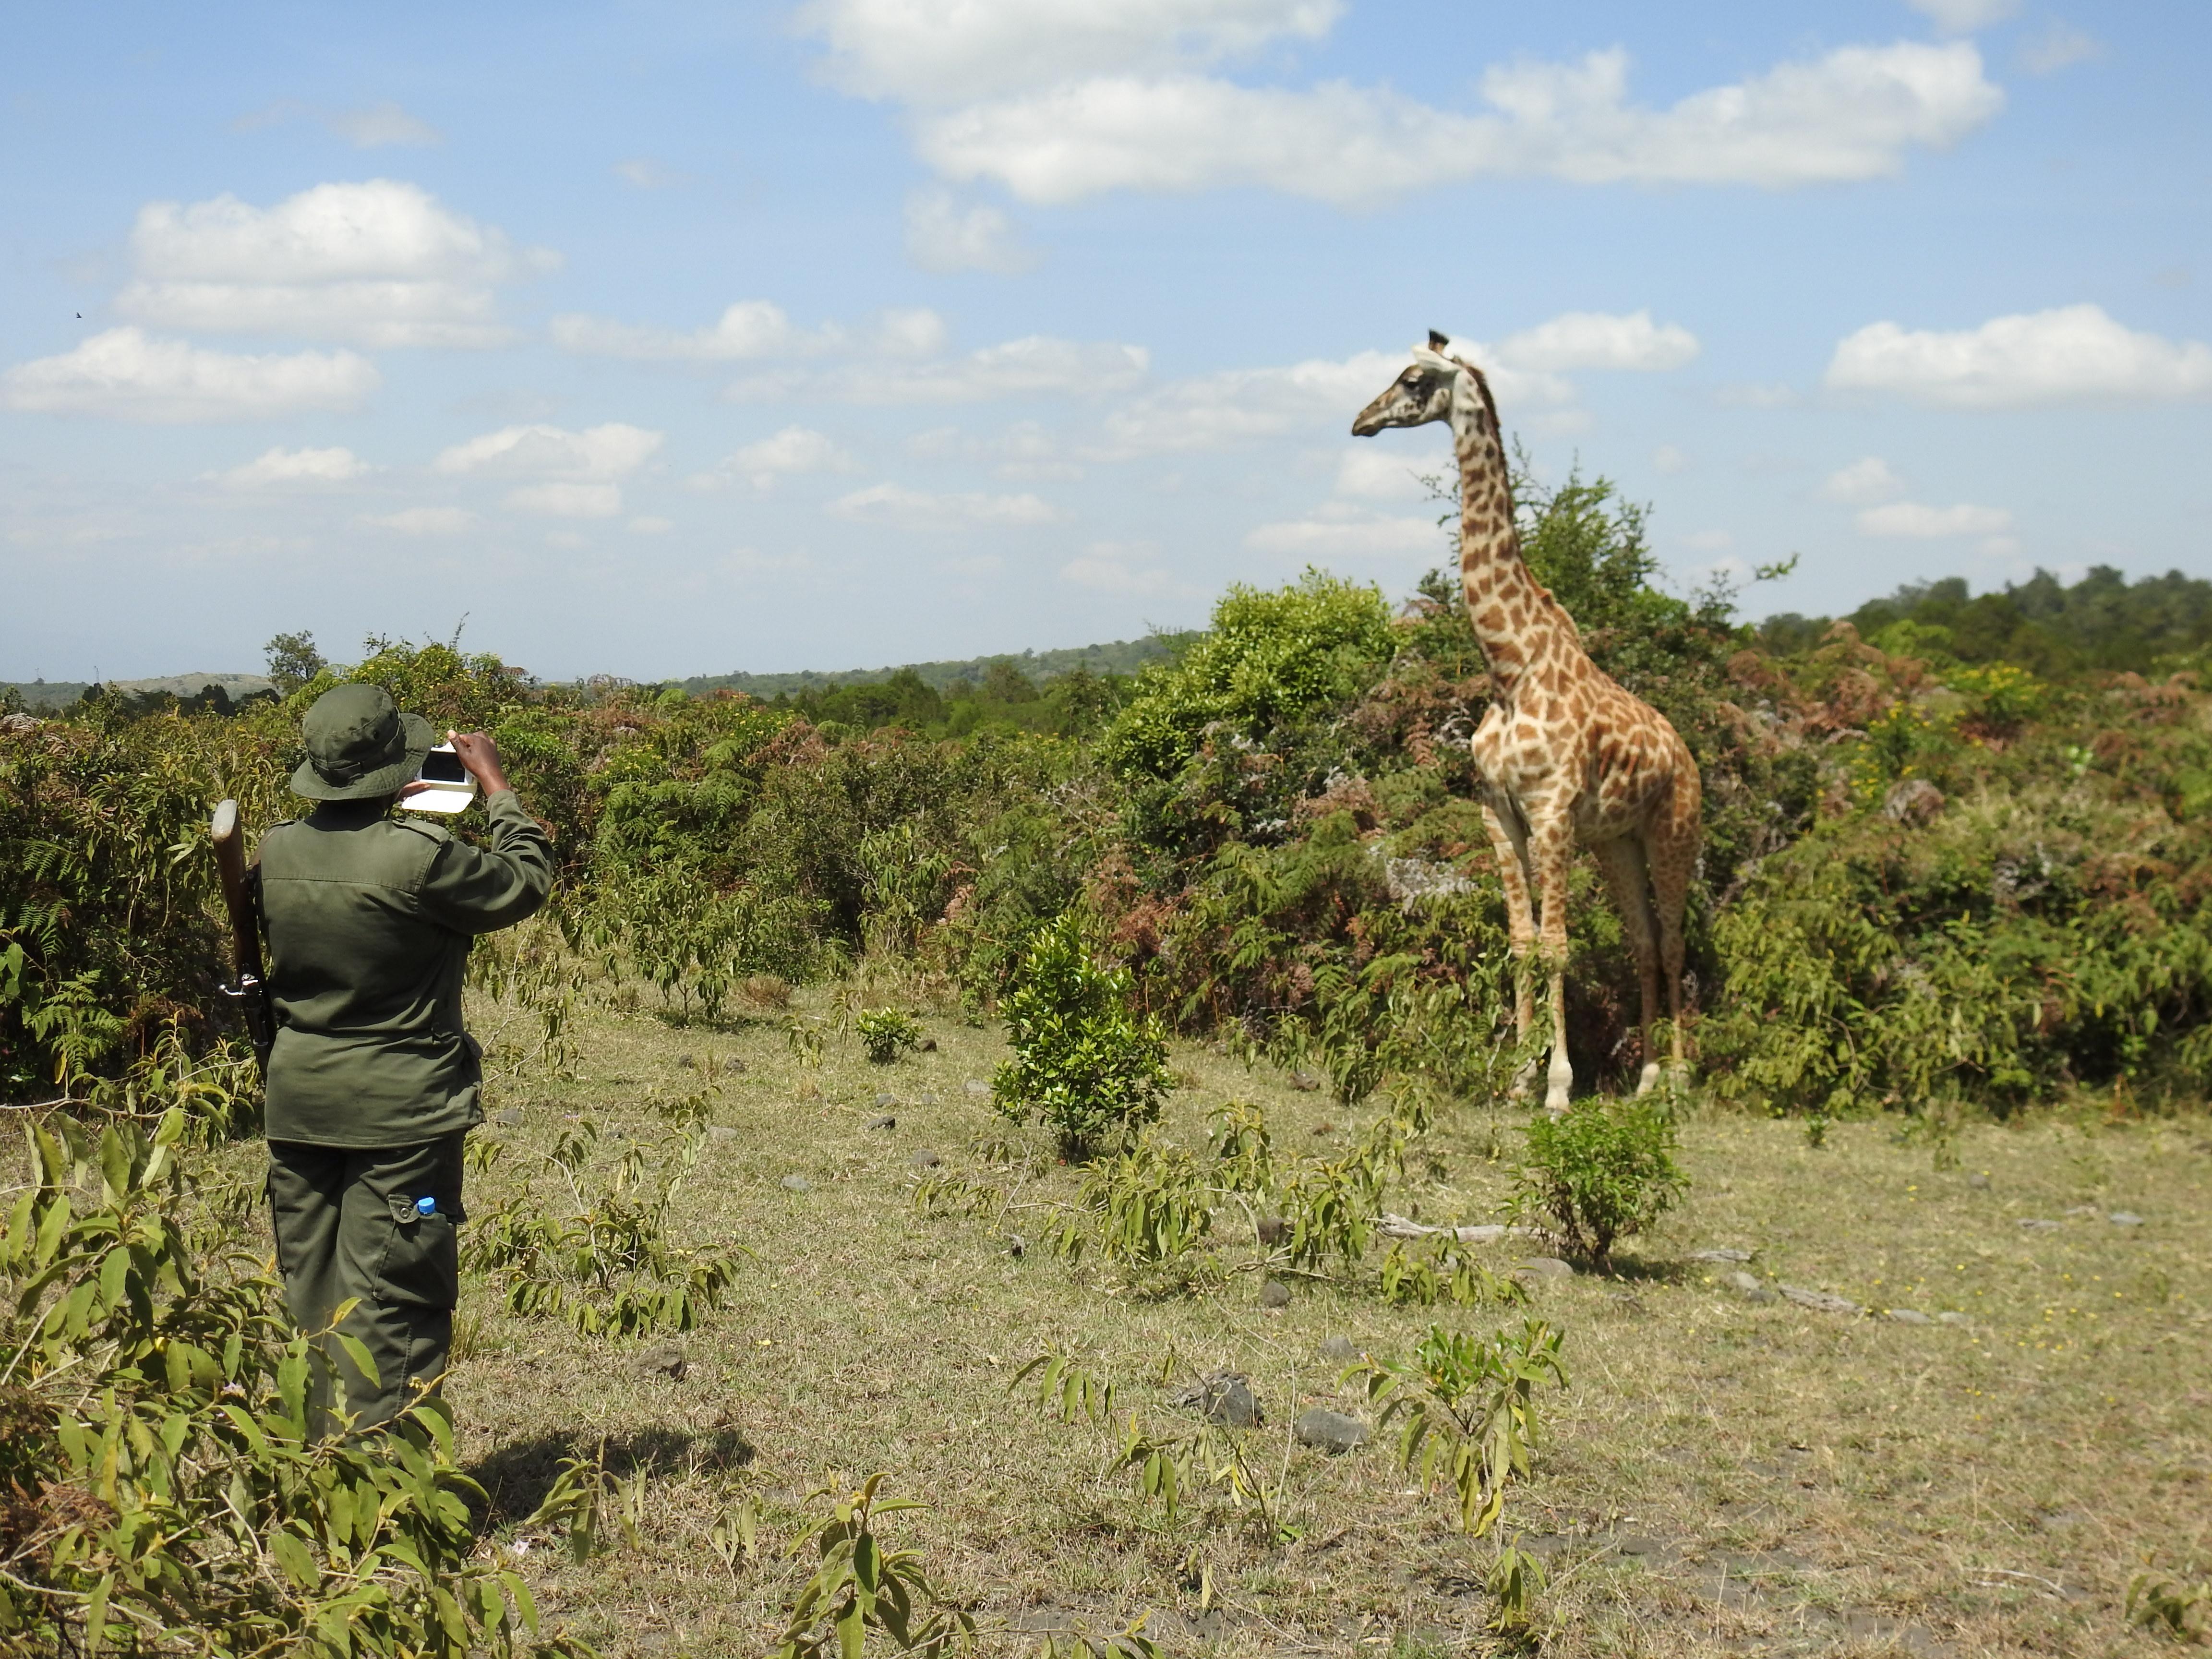 Giraffe_Guide_Selfie.jpg